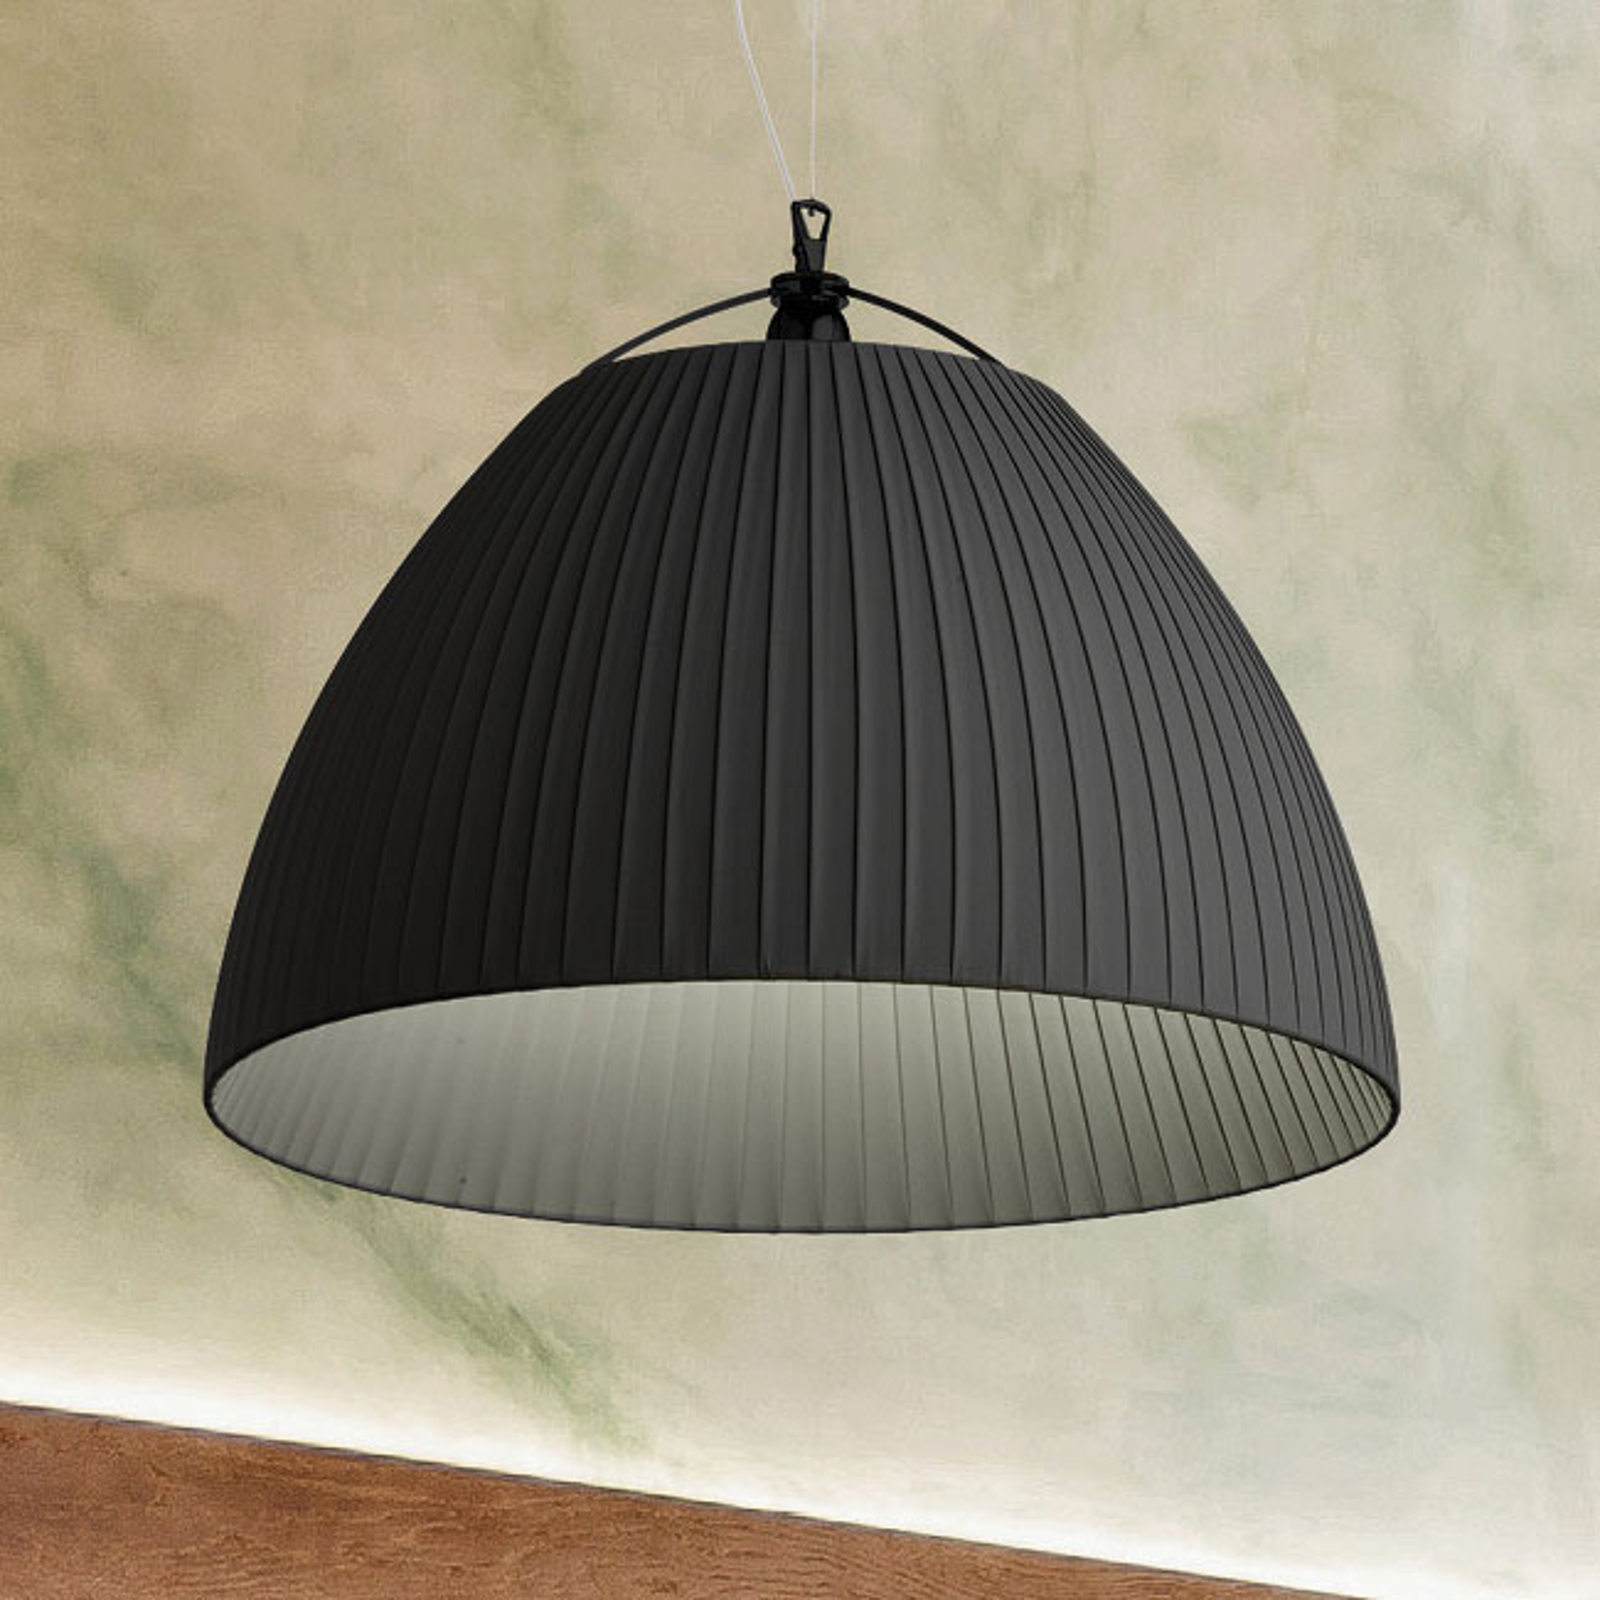 Modo Luce Olivia lampa wisząca Ø 60 cm czarna